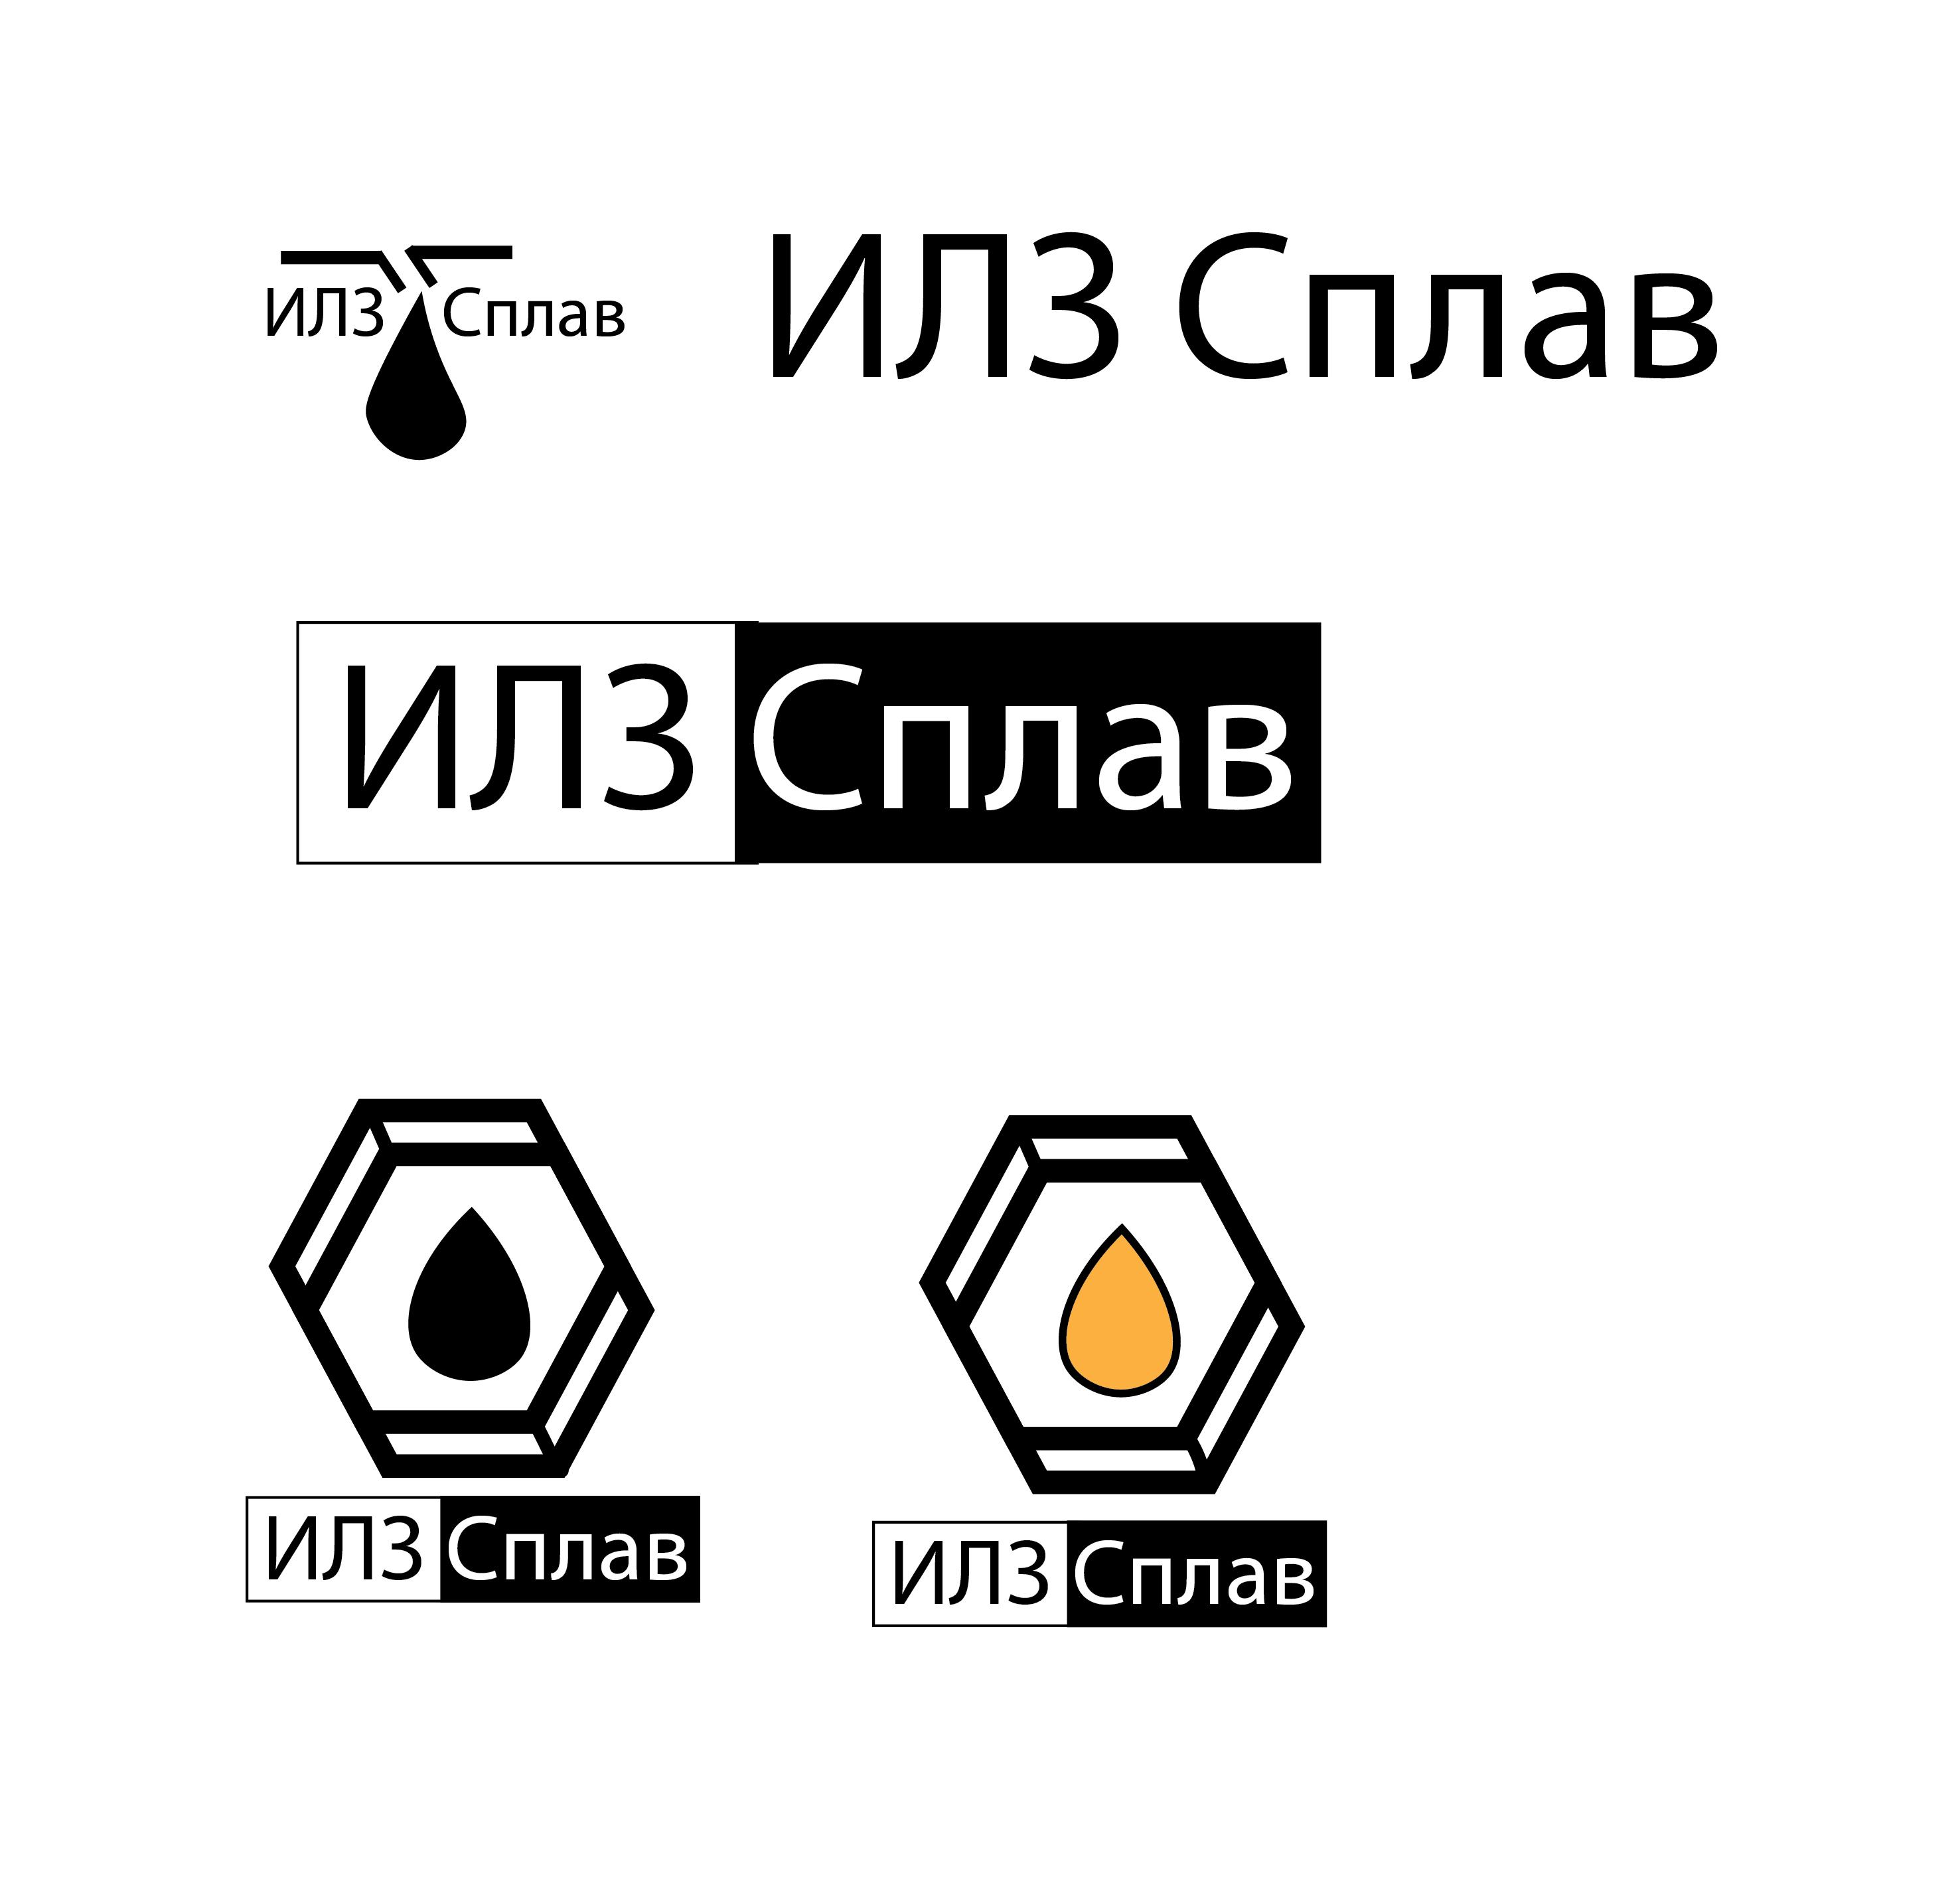 Разработать логотип для литейного завода фото f_2415afaceae9735f.jpg